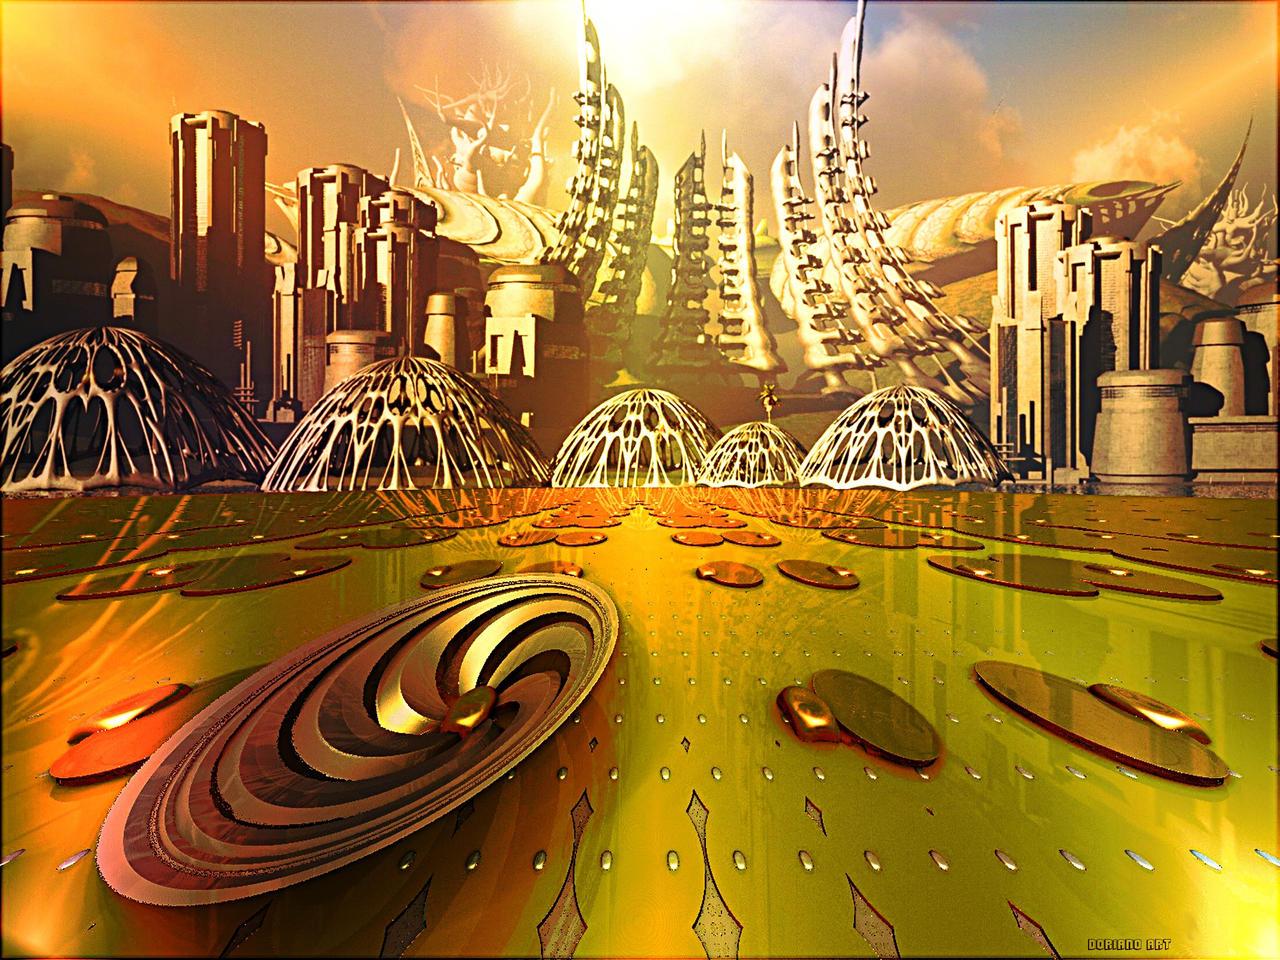 RODHIAN  TECHNOLOGIES by DorianoArt